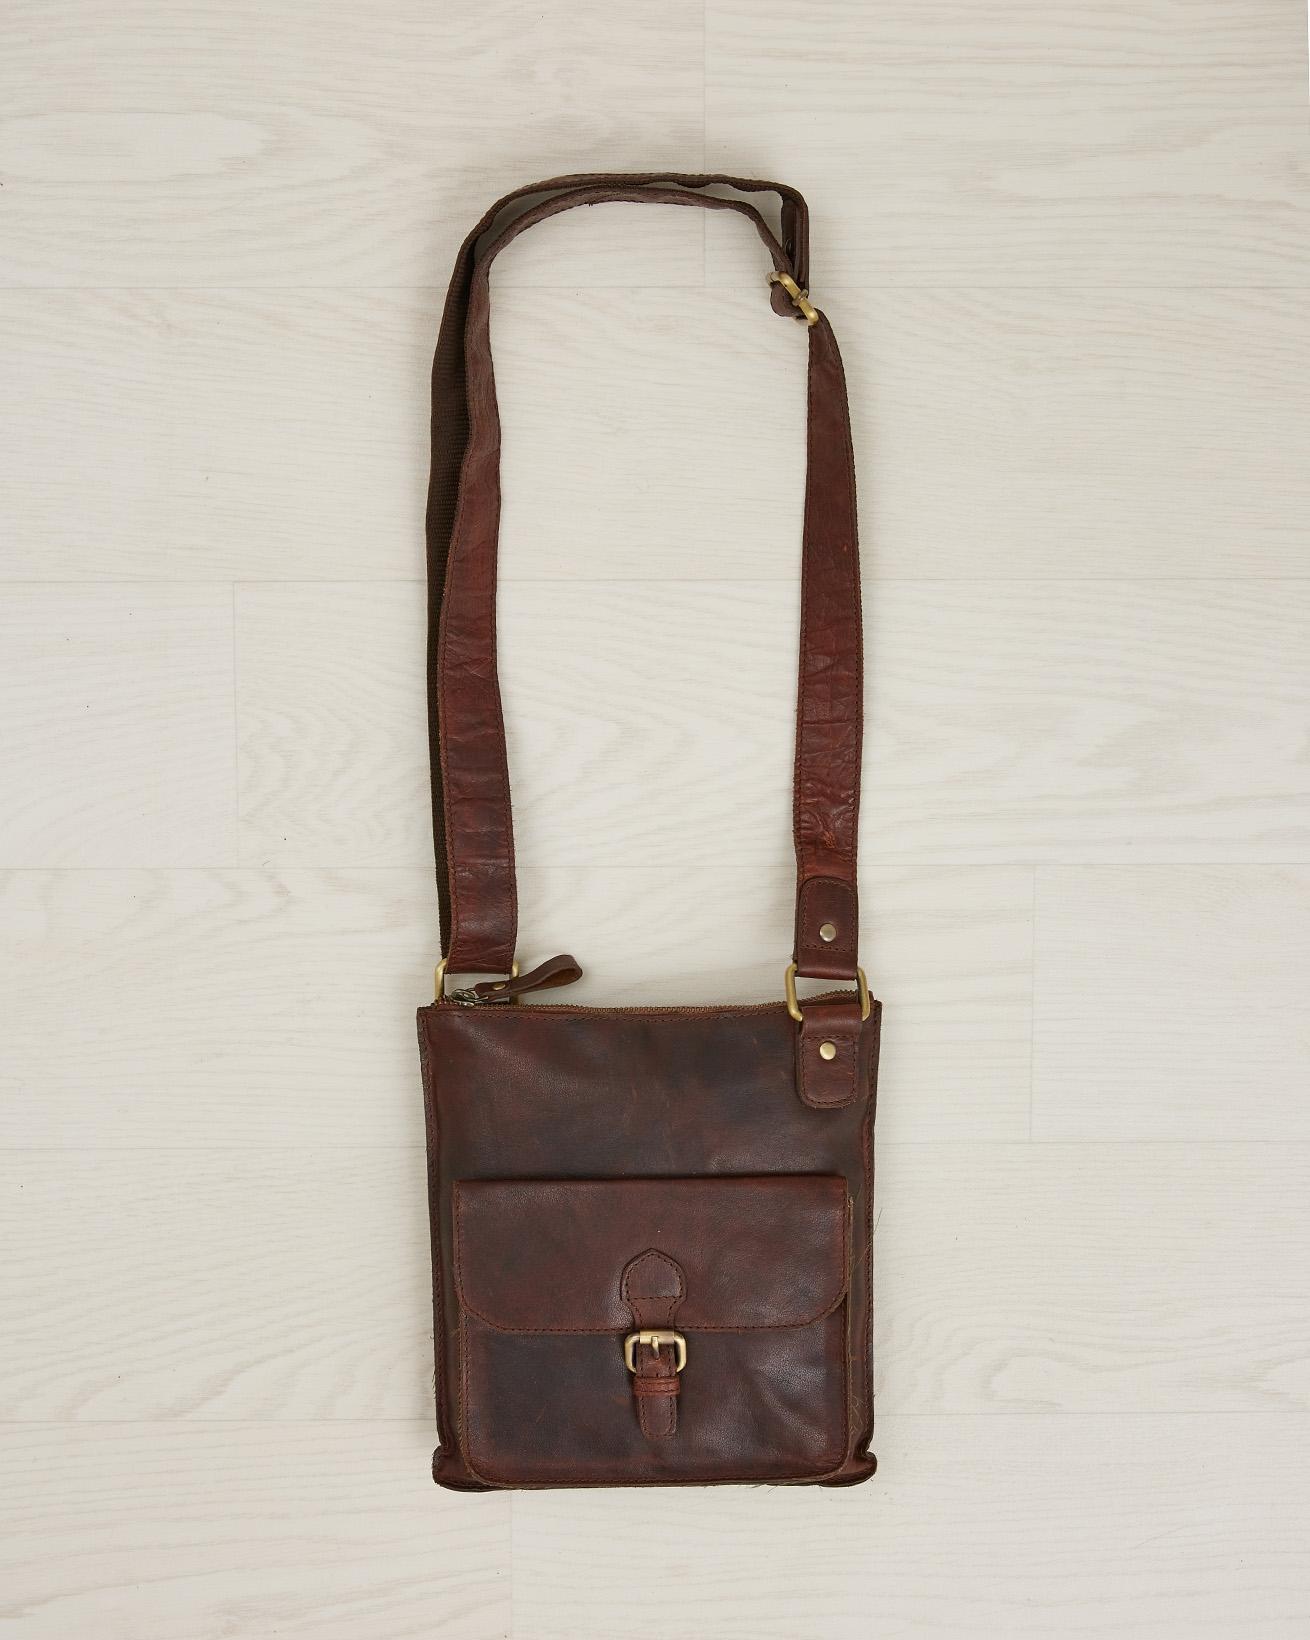 Rigger Bag One/Size - Dark Chocolate - 2390